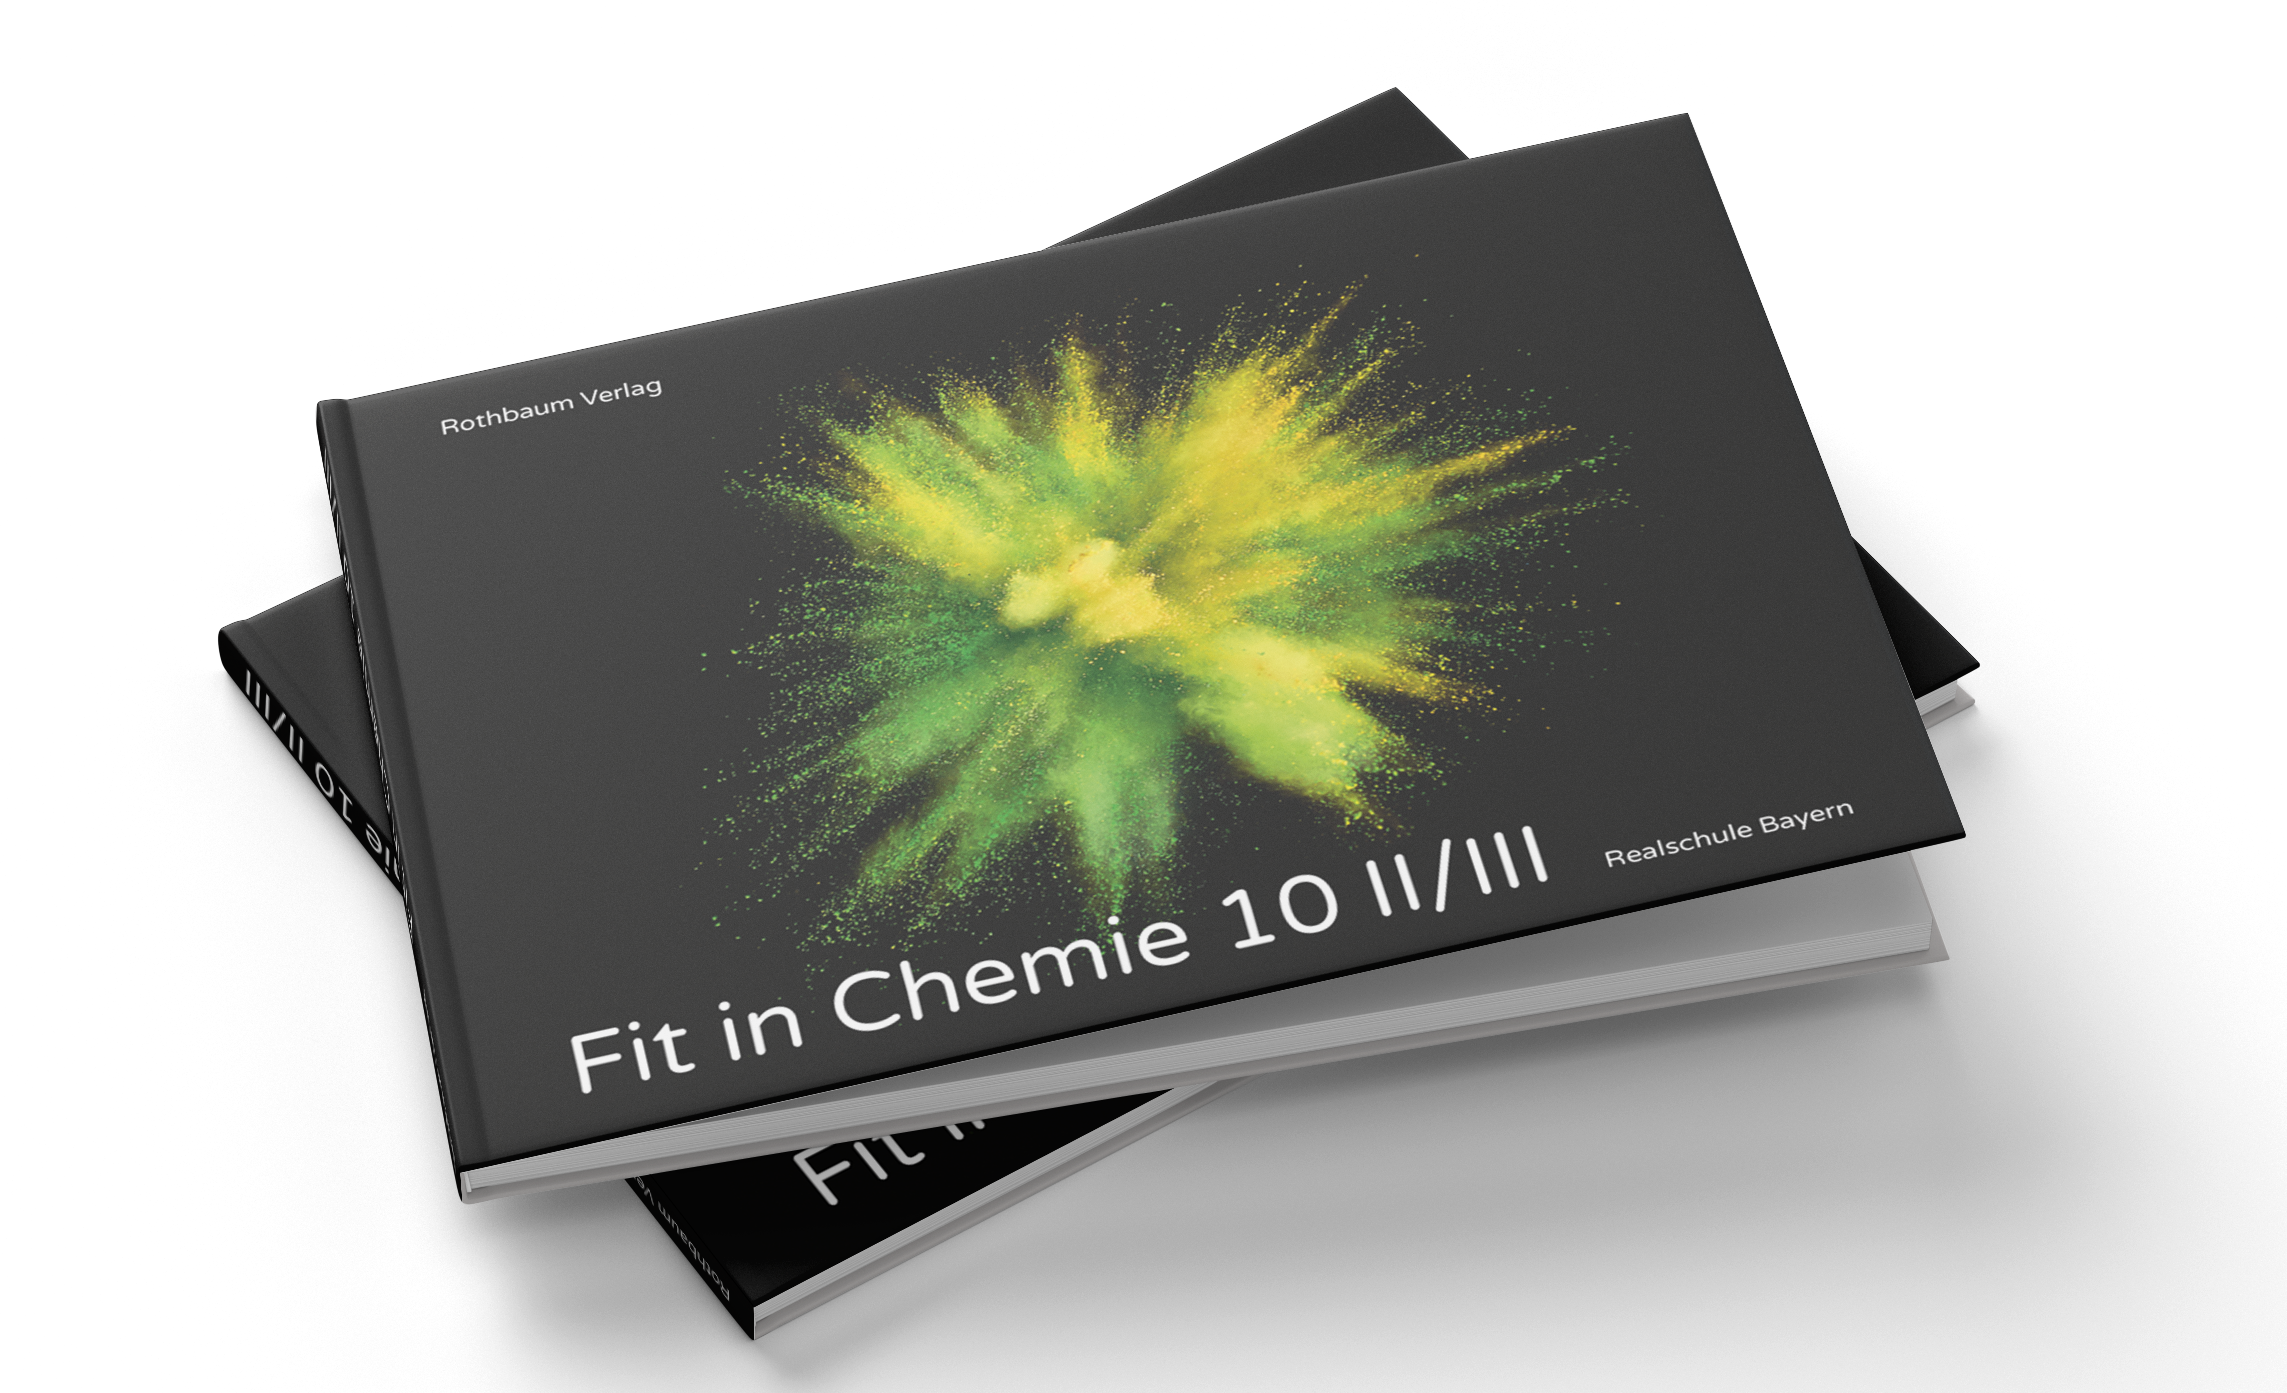 Fit in Chemie 10 II/III [gedrucktes Schulbuch]